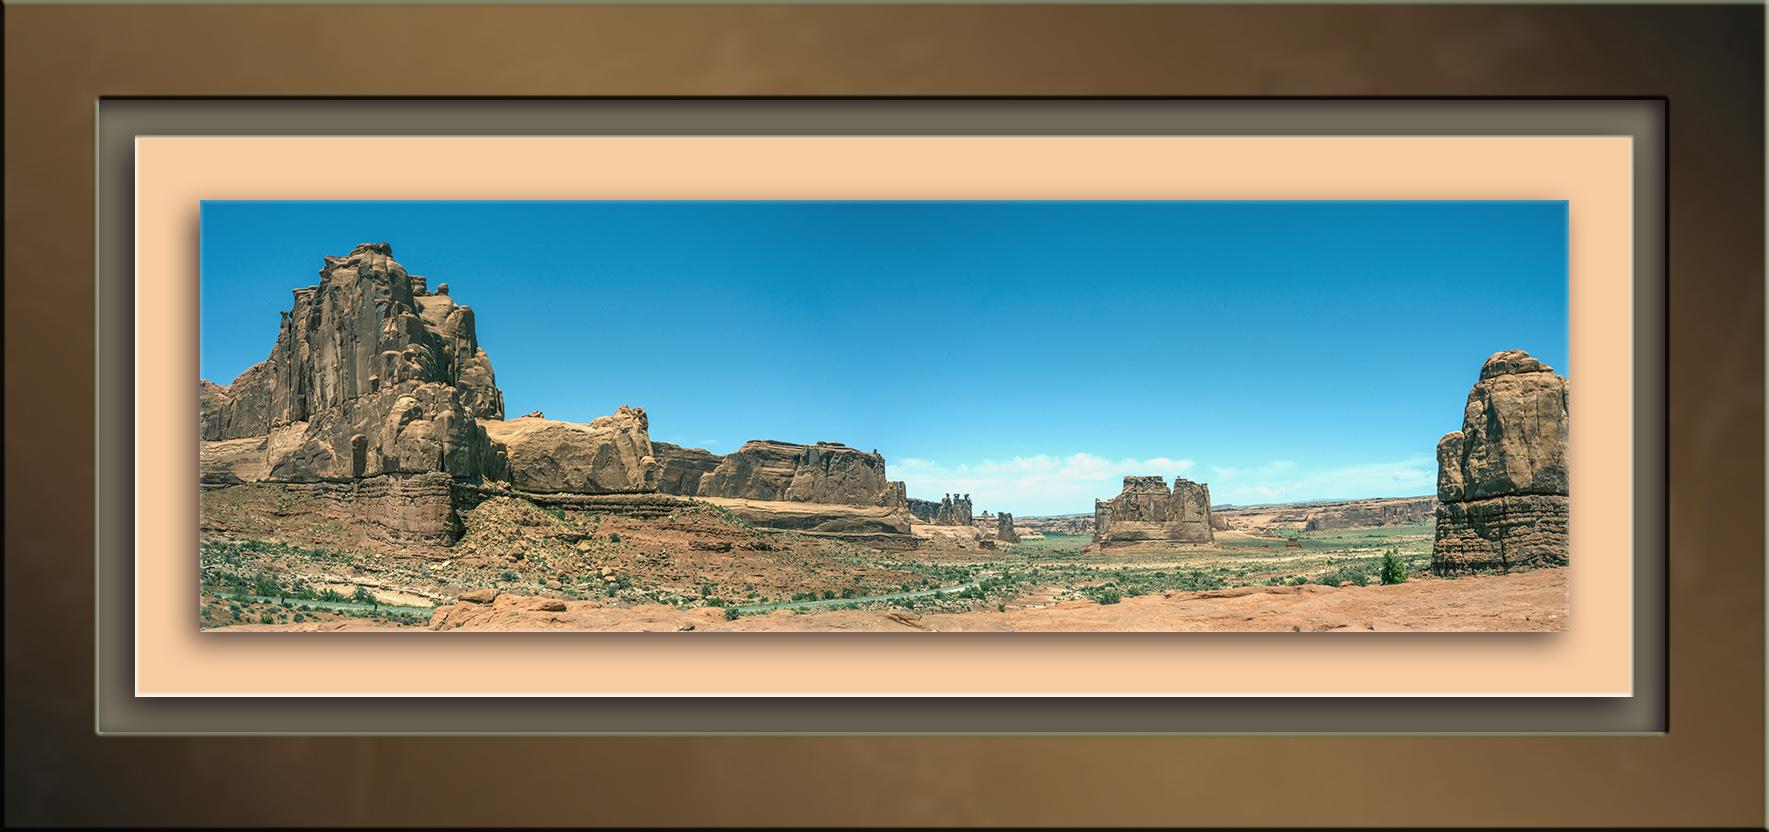 june-trip-d800-2445-pano-arches-nat-park-blog-ii